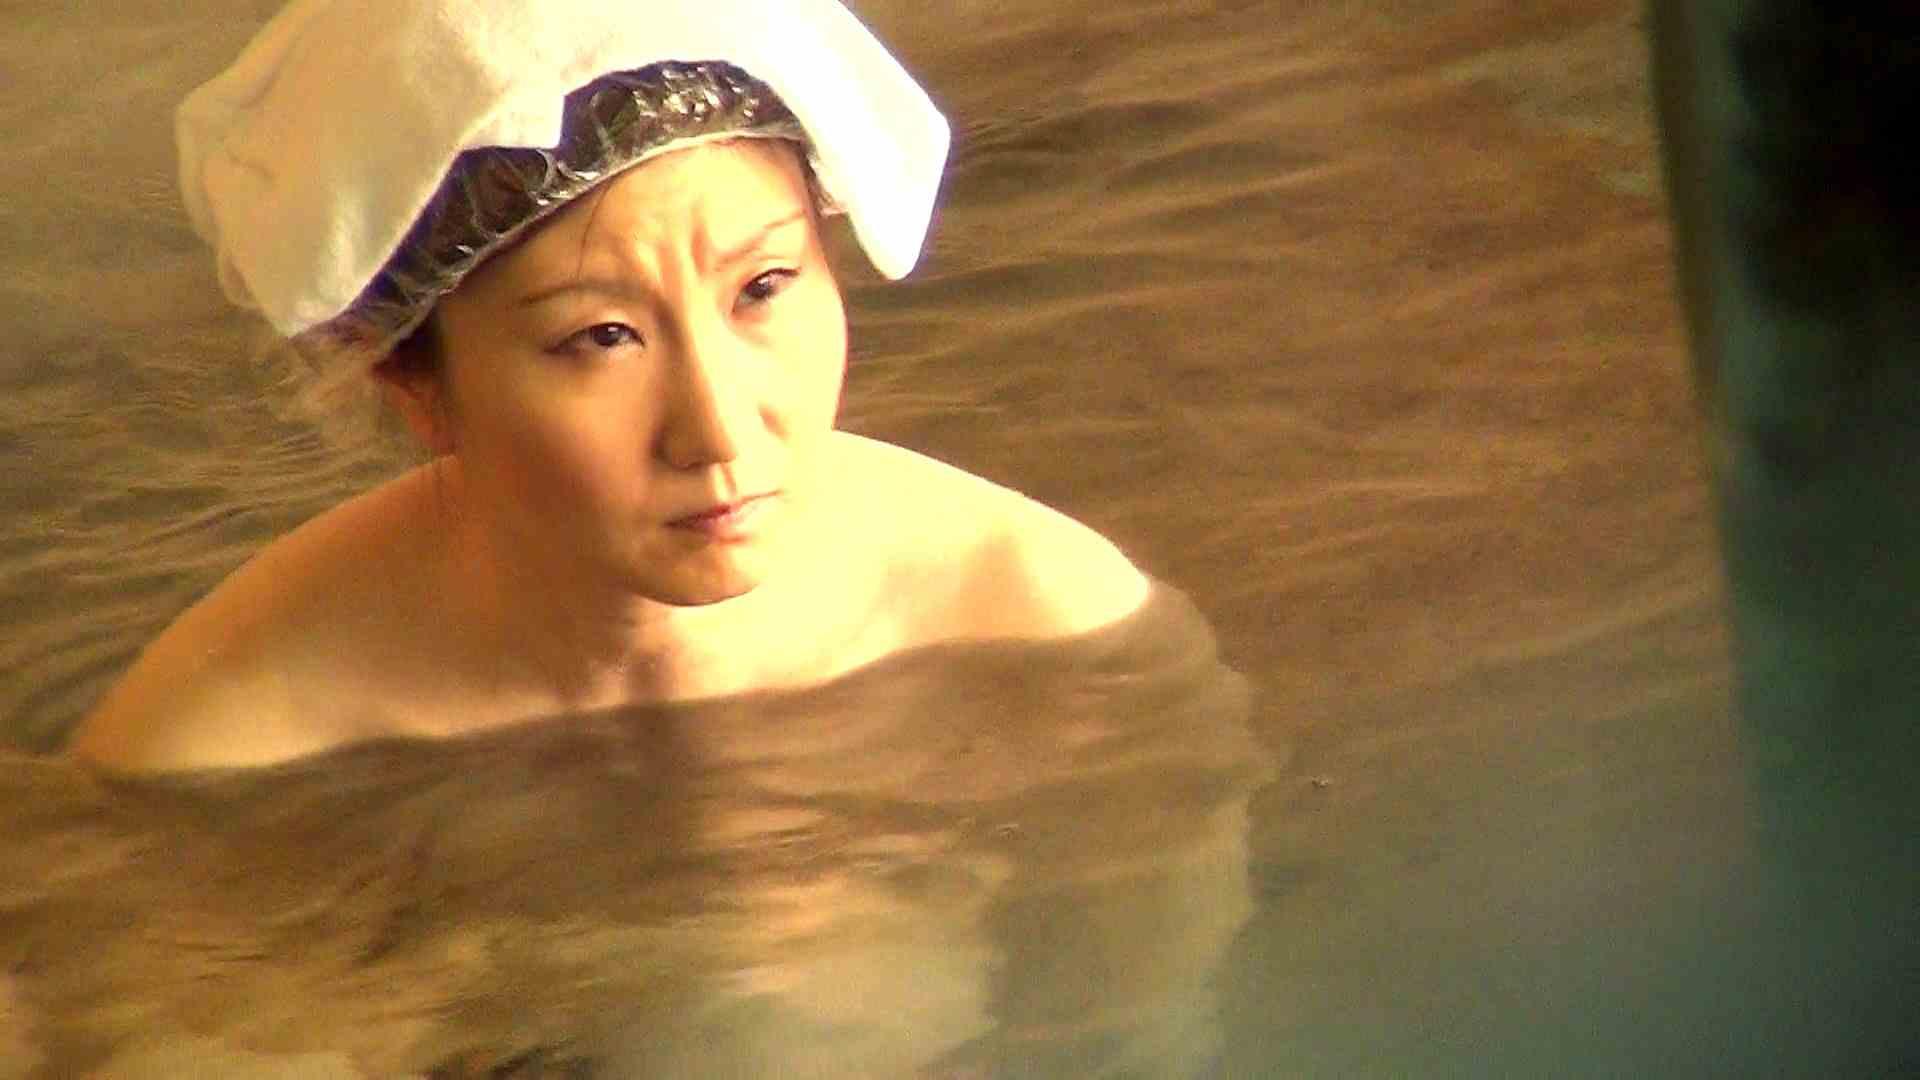 Aquaな露天風呂Vol.278 盗撮シリーズ | 露天風呂編  100PIX 57